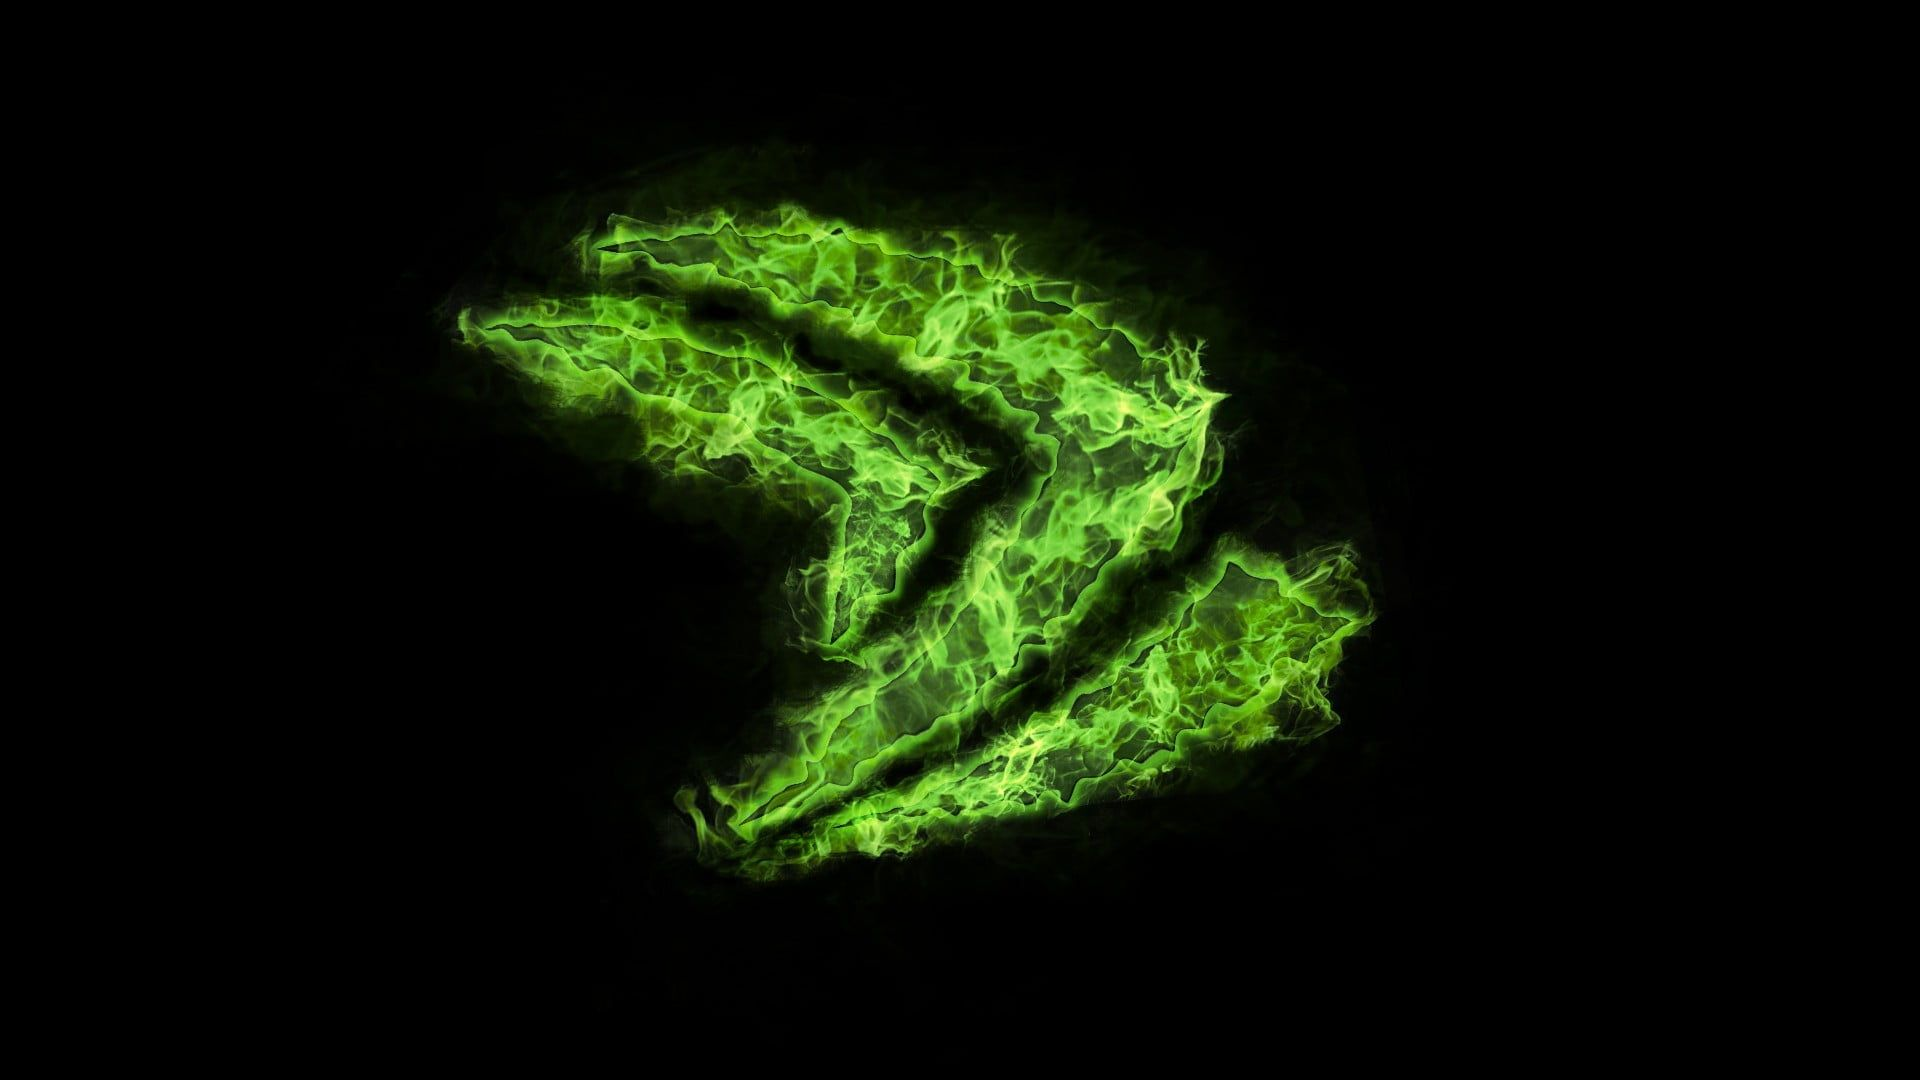 Green Wallpaper Nvidia Dark Minimalism 1080p Wallpaper